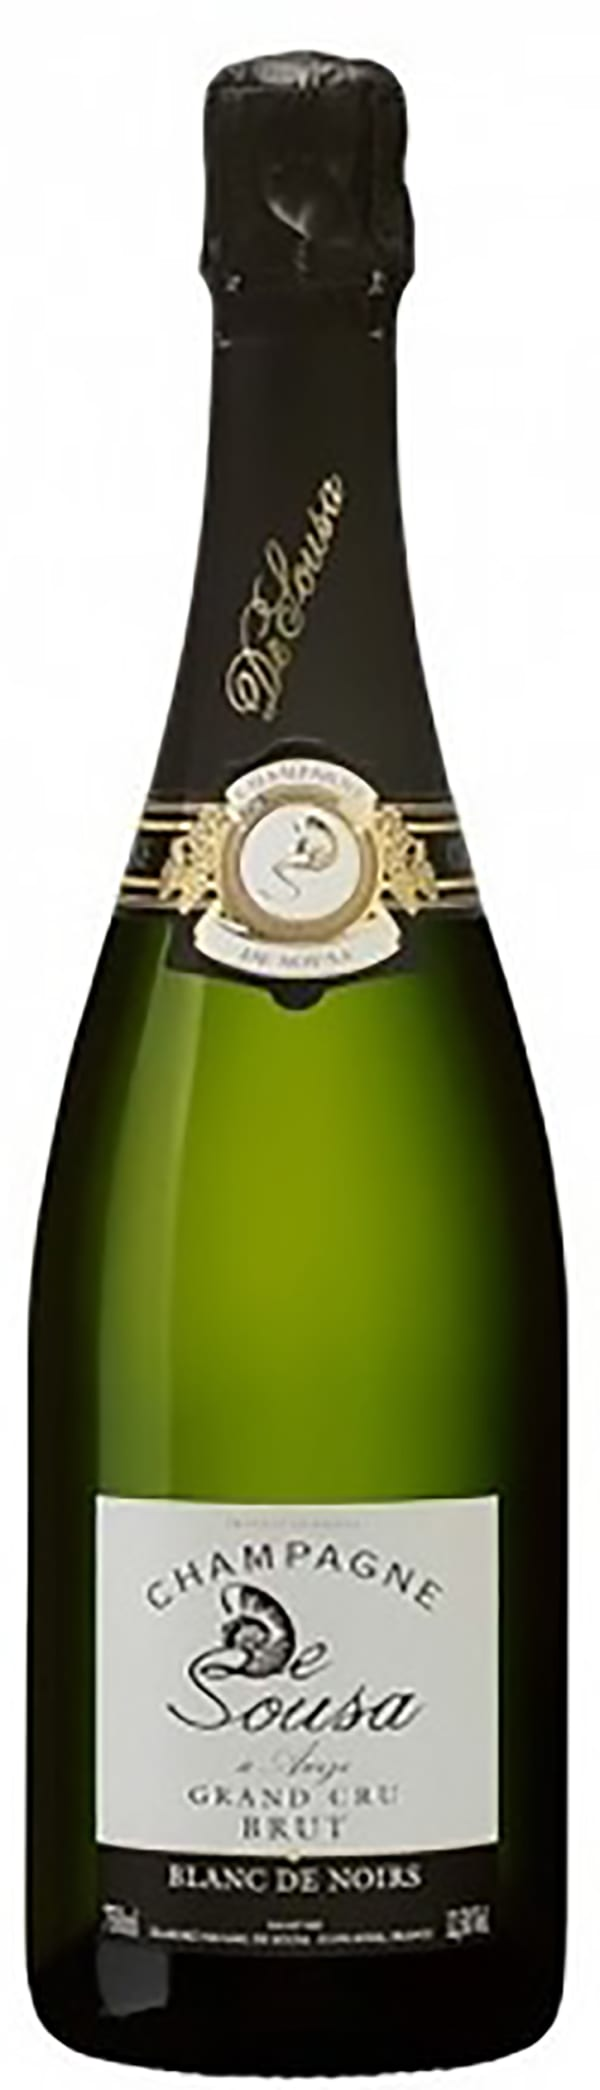 De Sousa Blanc de Noir Grand Cru Champagne Brut